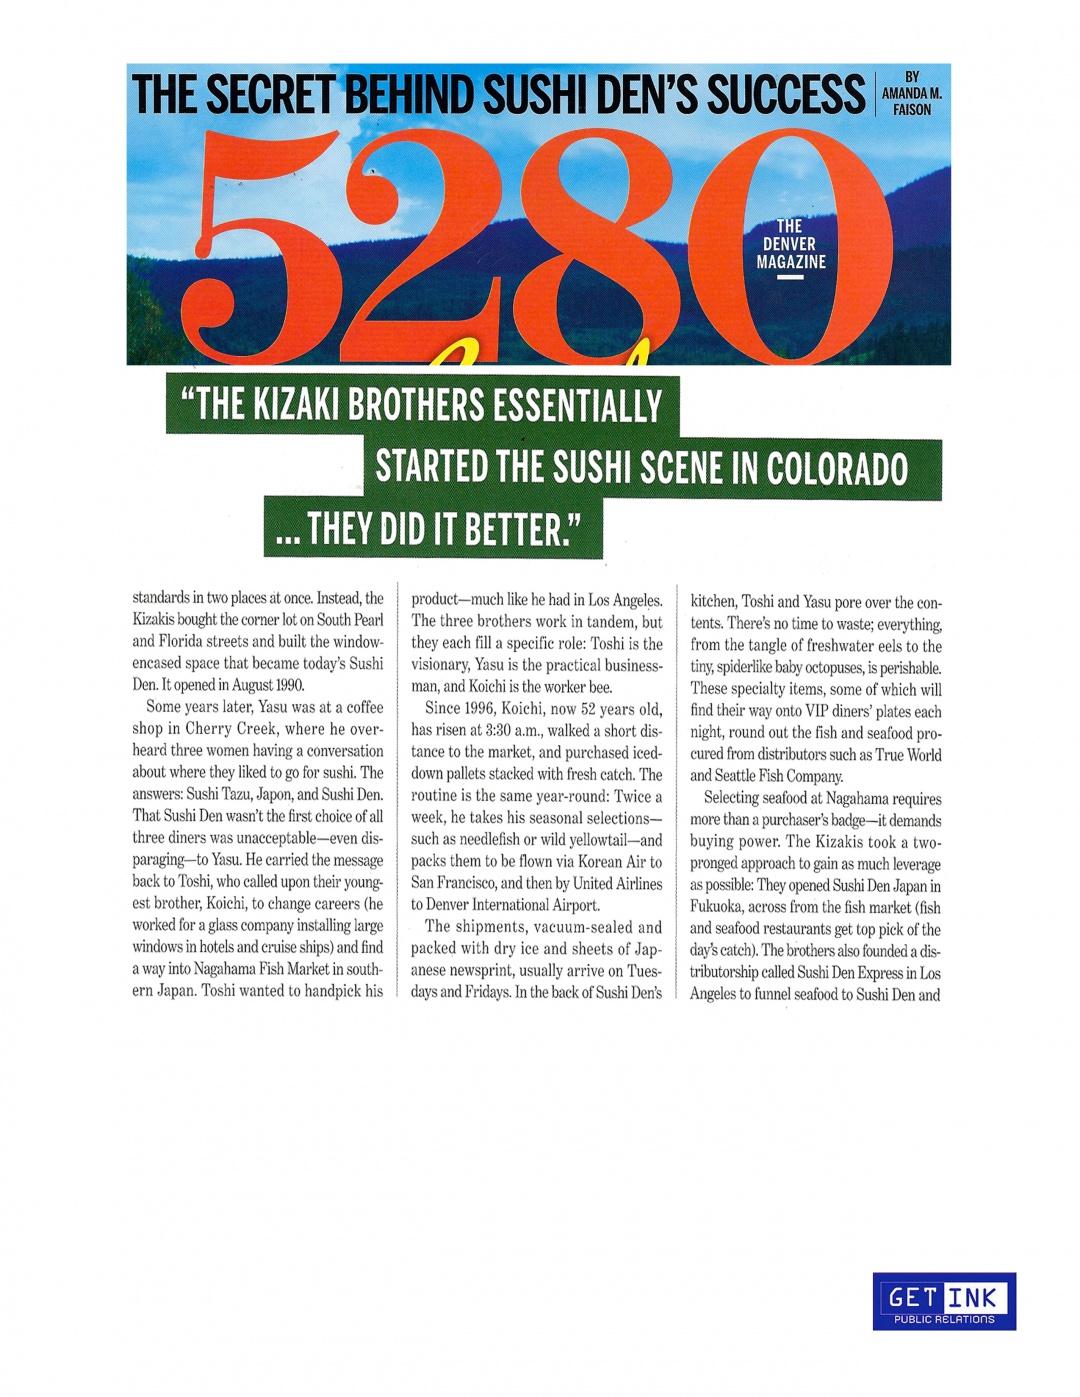 5280-Magazine-8-5.16.12